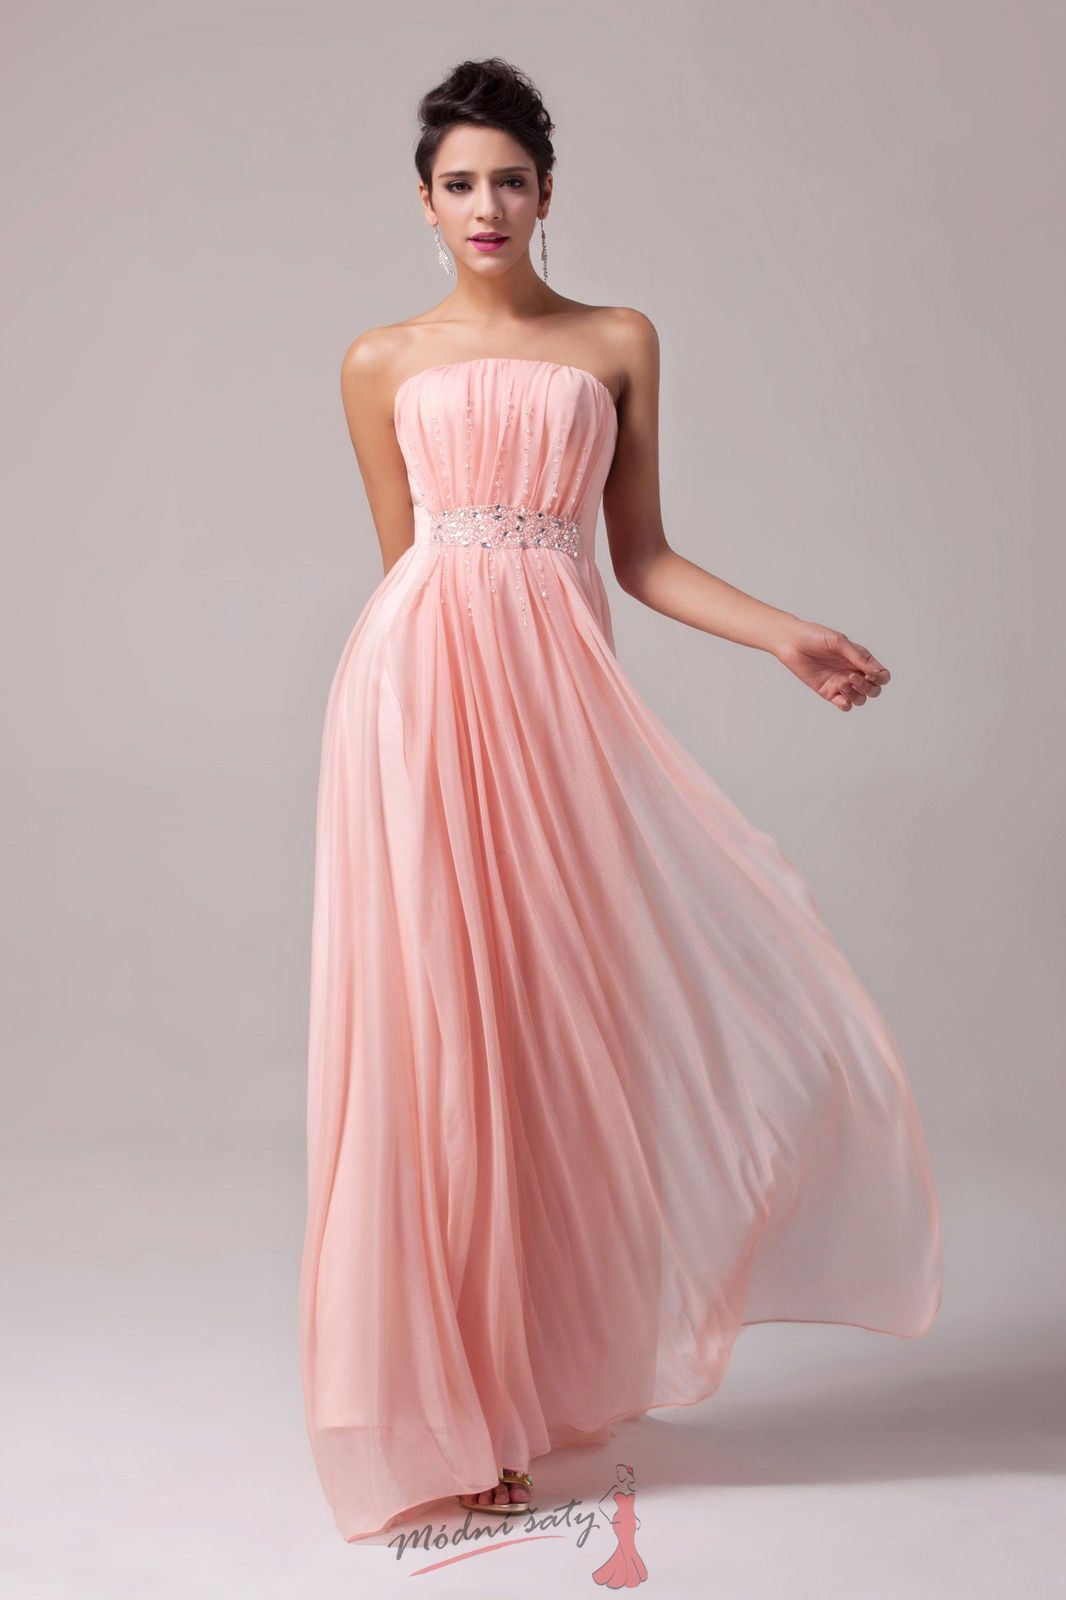 Romantické plesové šaty s čirými korálky | Dresses | Pinterest ...